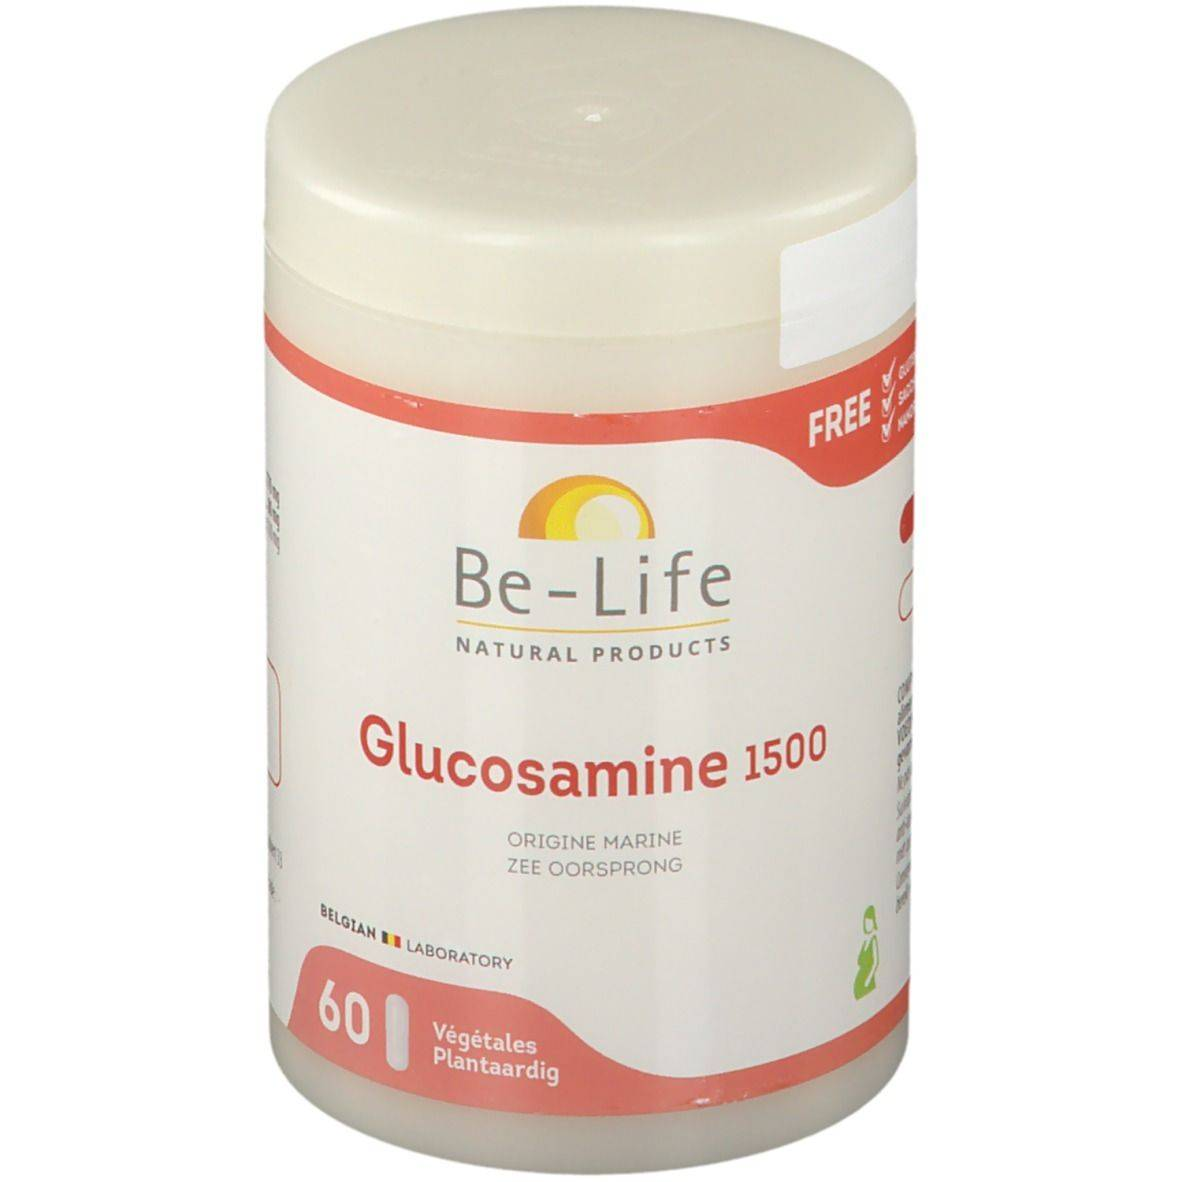 Be-Life Glucosamine 1500 mg pc(s) capsule(s)